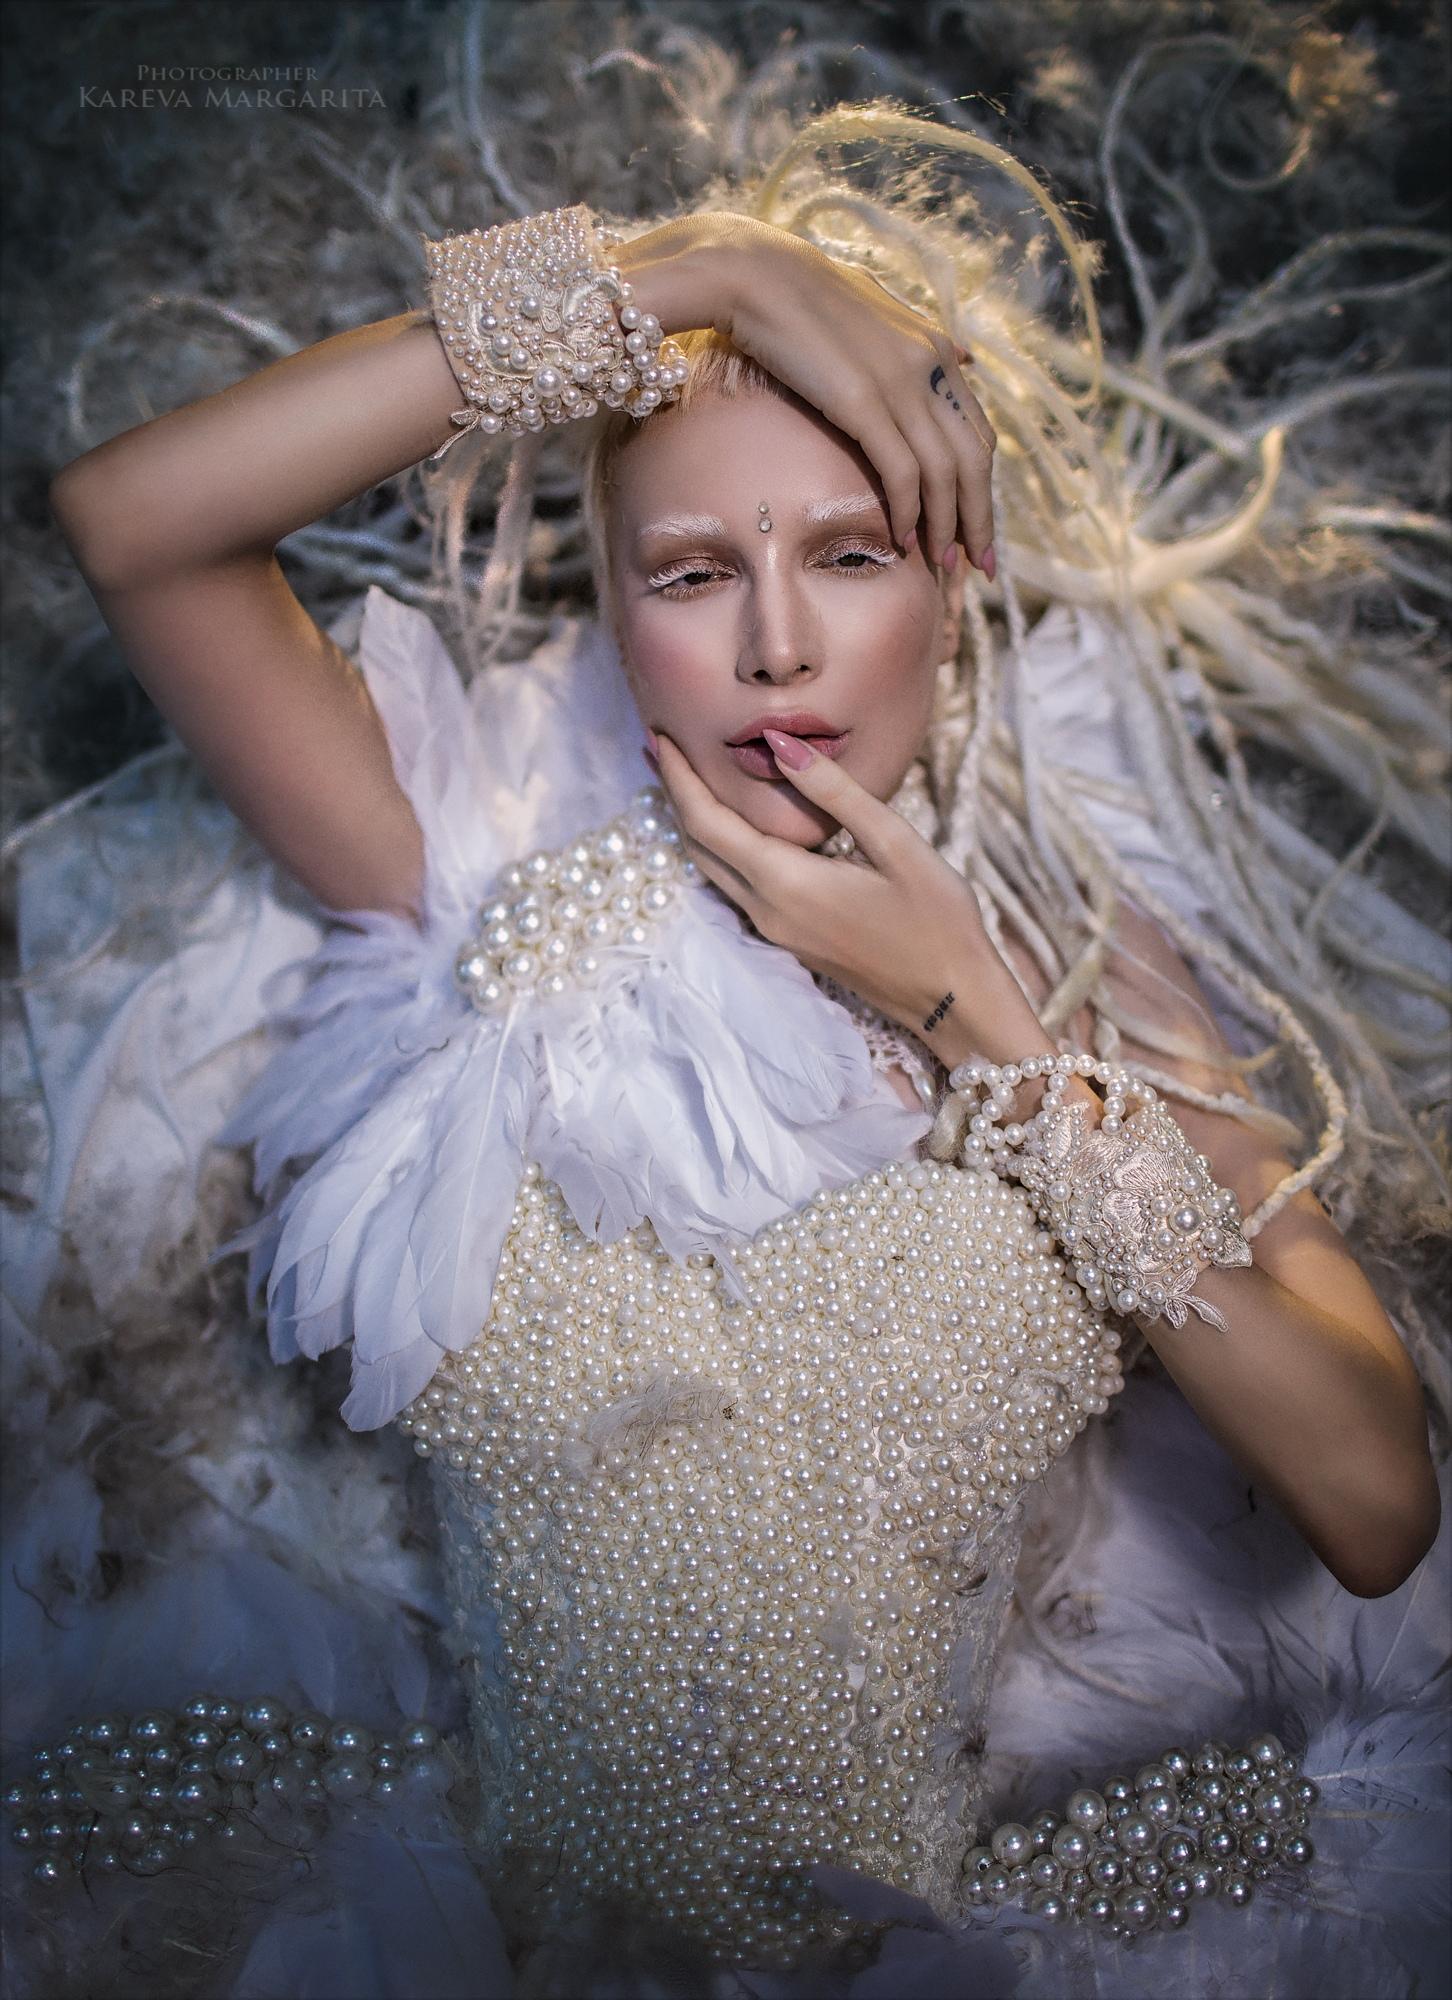 Ангельская птица / фотограф Margarita Kareva